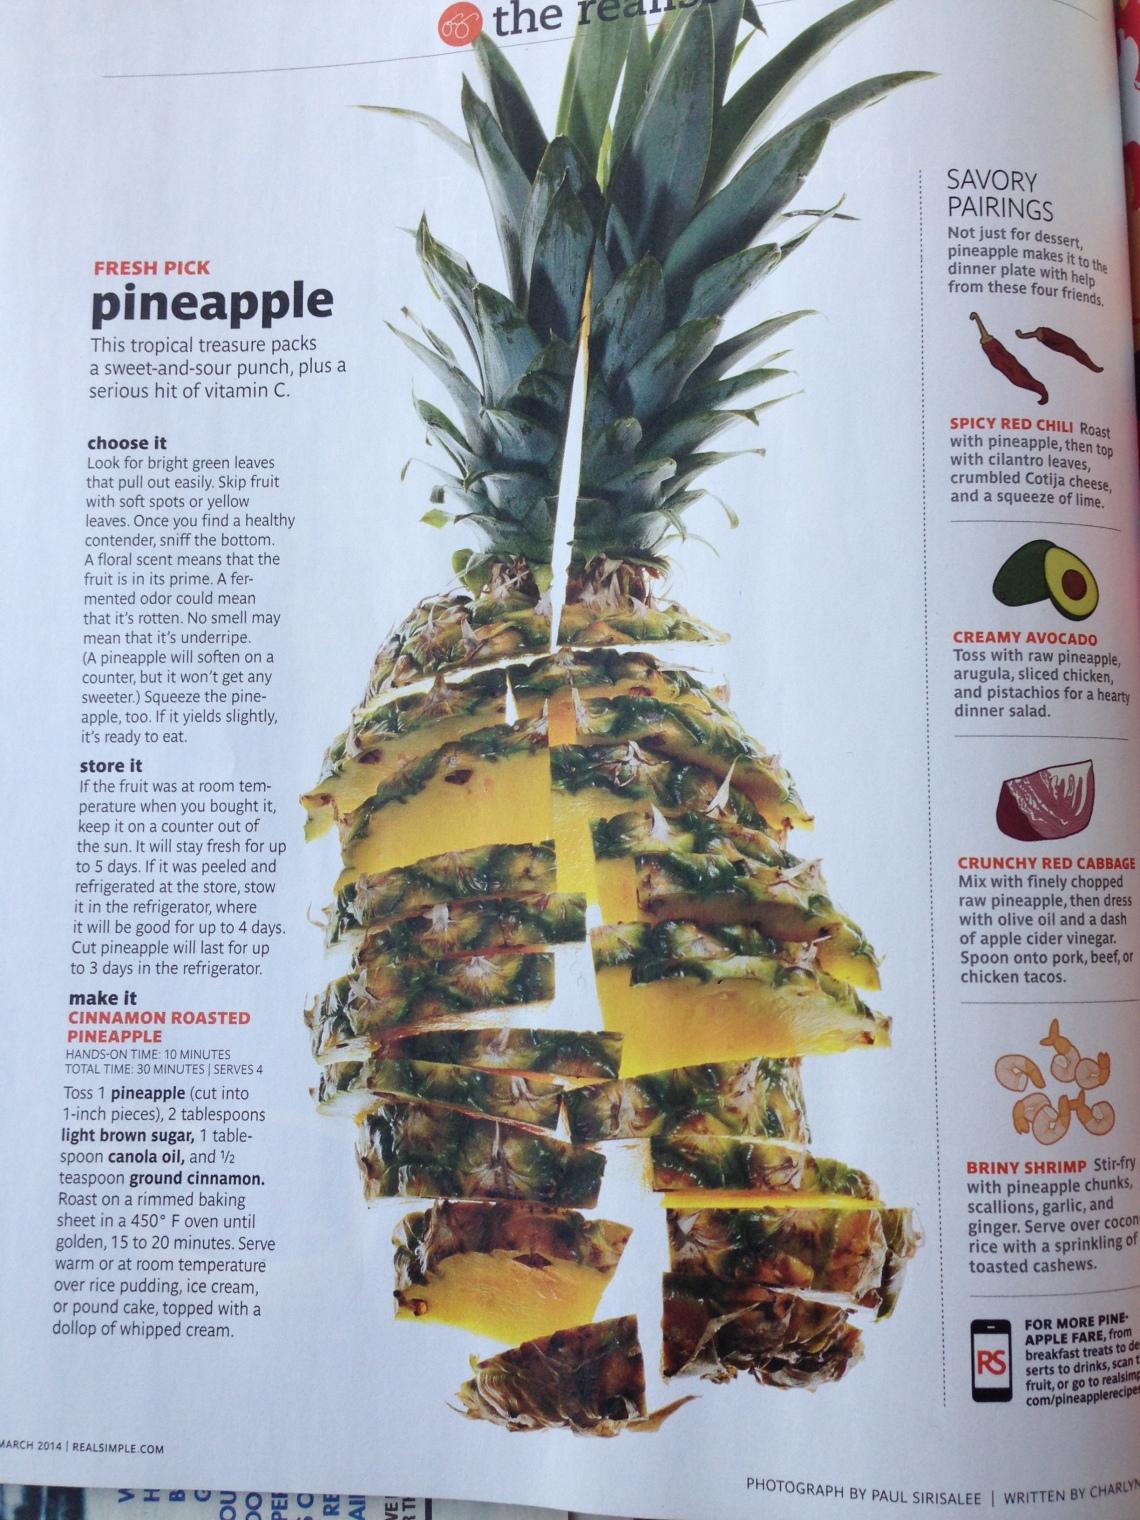 Fresh Pick Pineapple